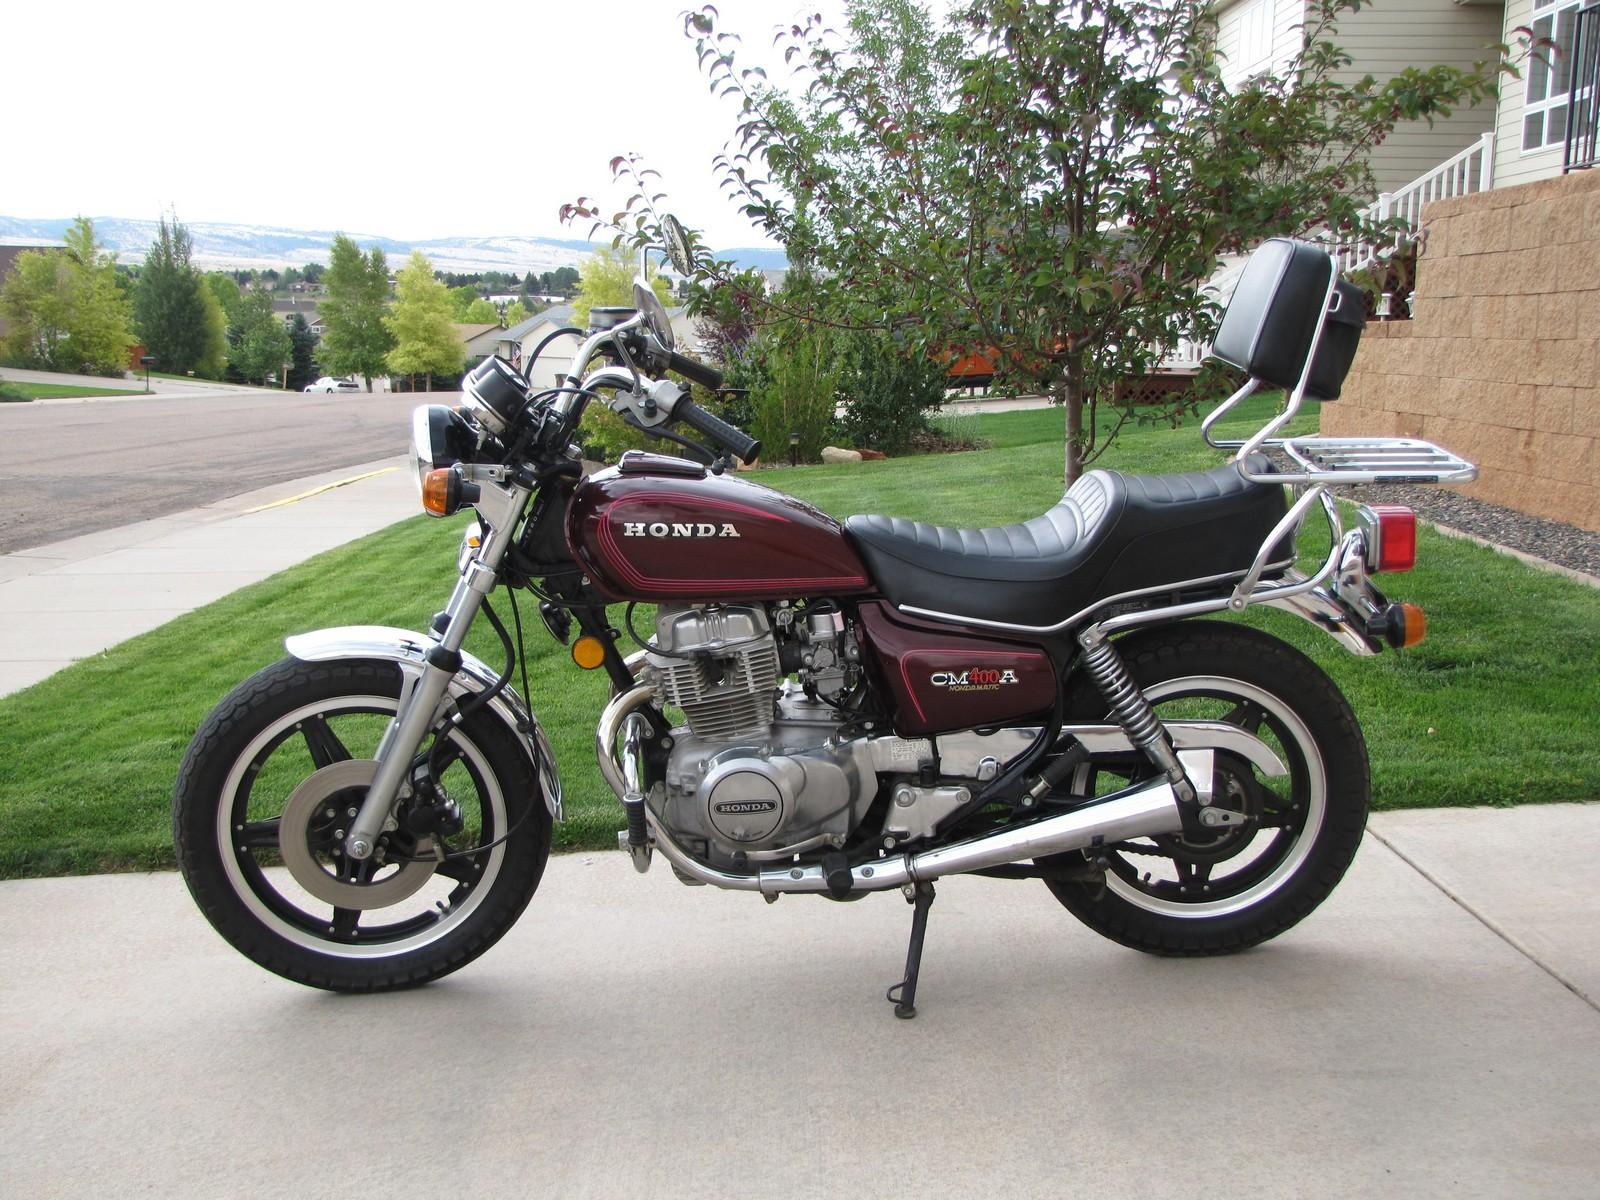 honda cm400 classic motorbikes. Black Bedroom Furniture Sets. Home Design Ideas